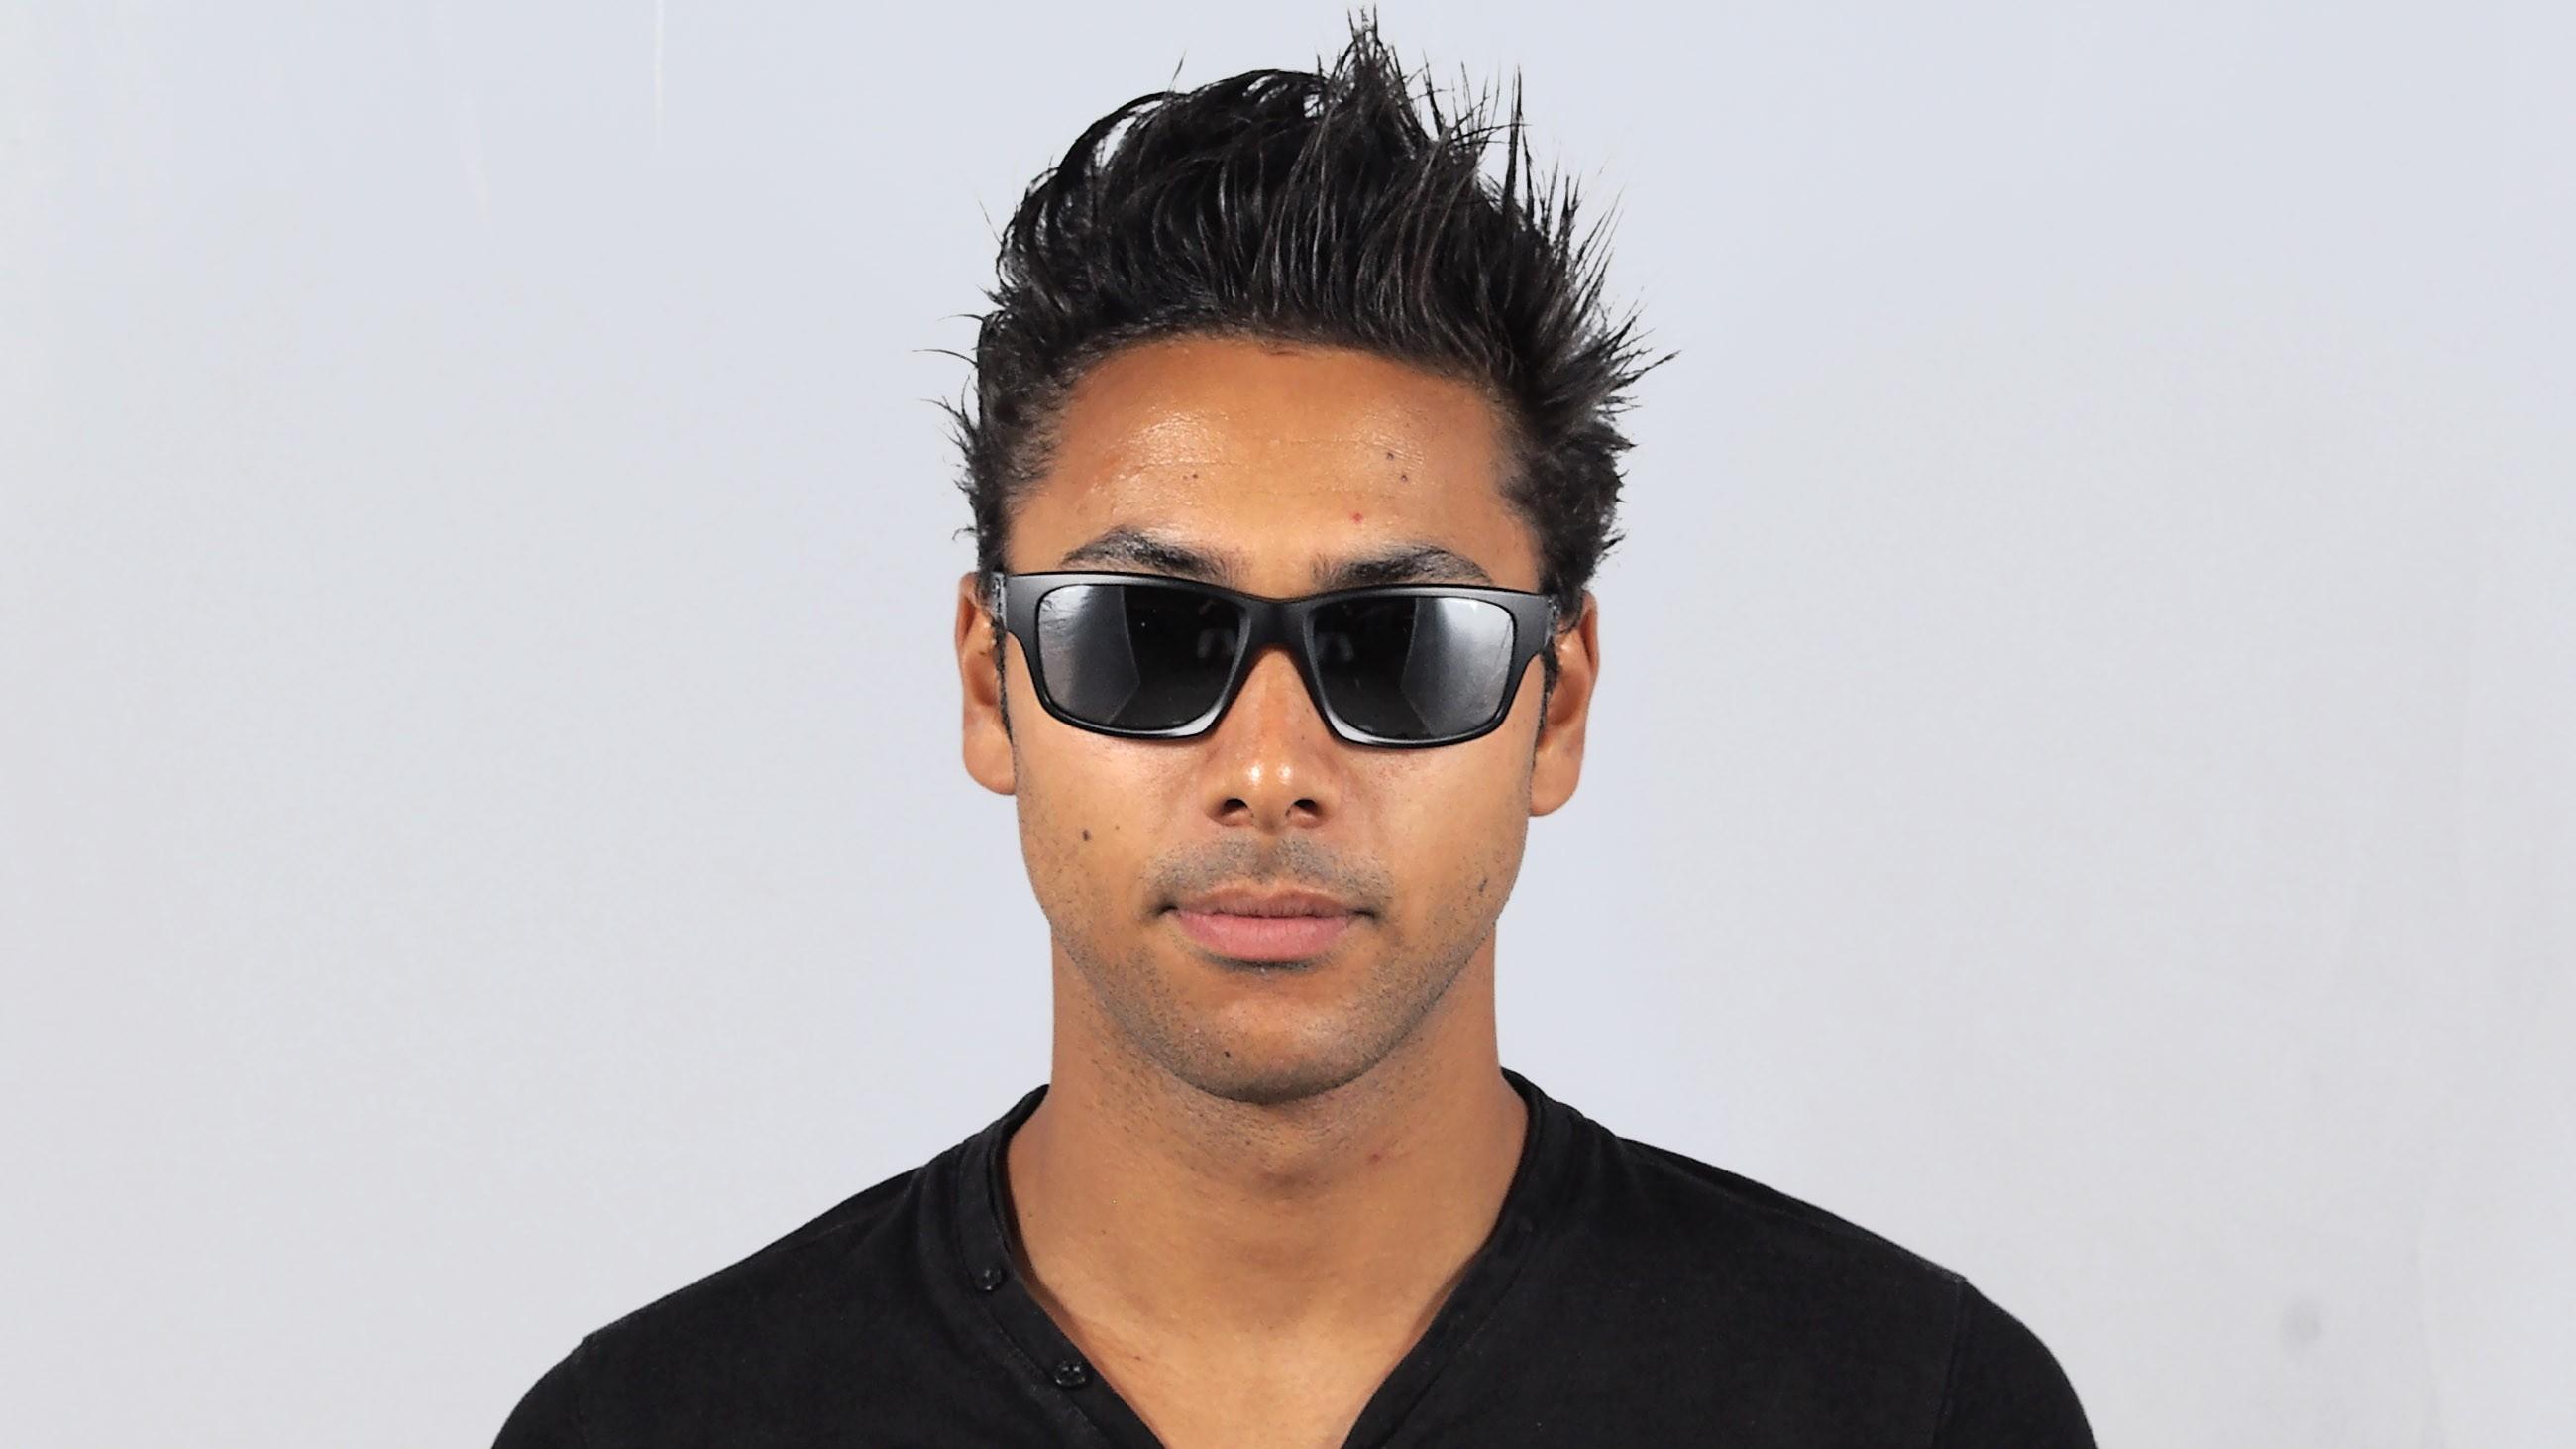 Oakley Sunglasses Jupiter  jupiter squared black oo9135 09 56 18 polarized visiofactory